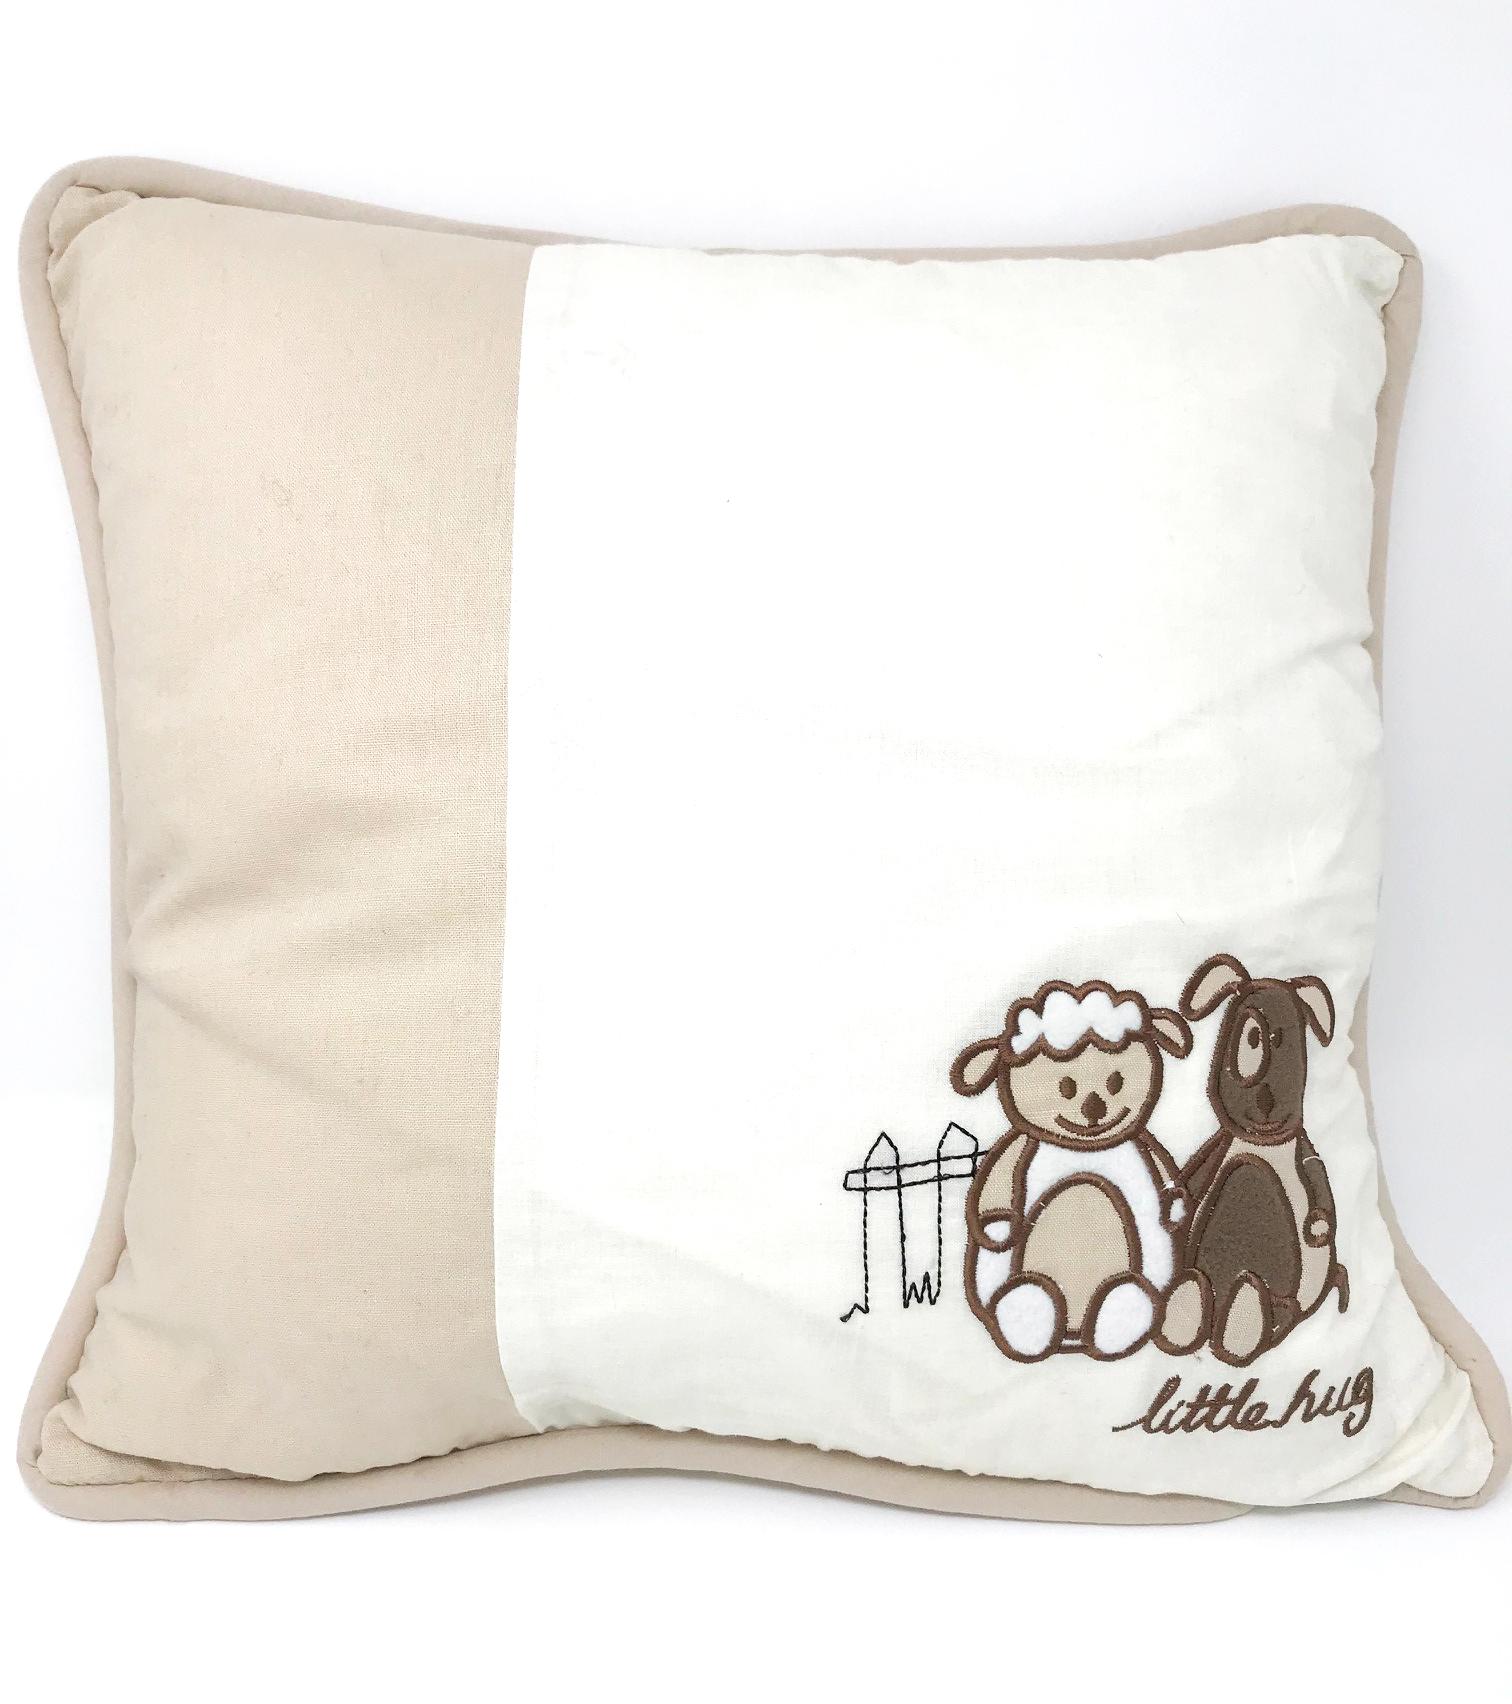 Little Hug Cushion